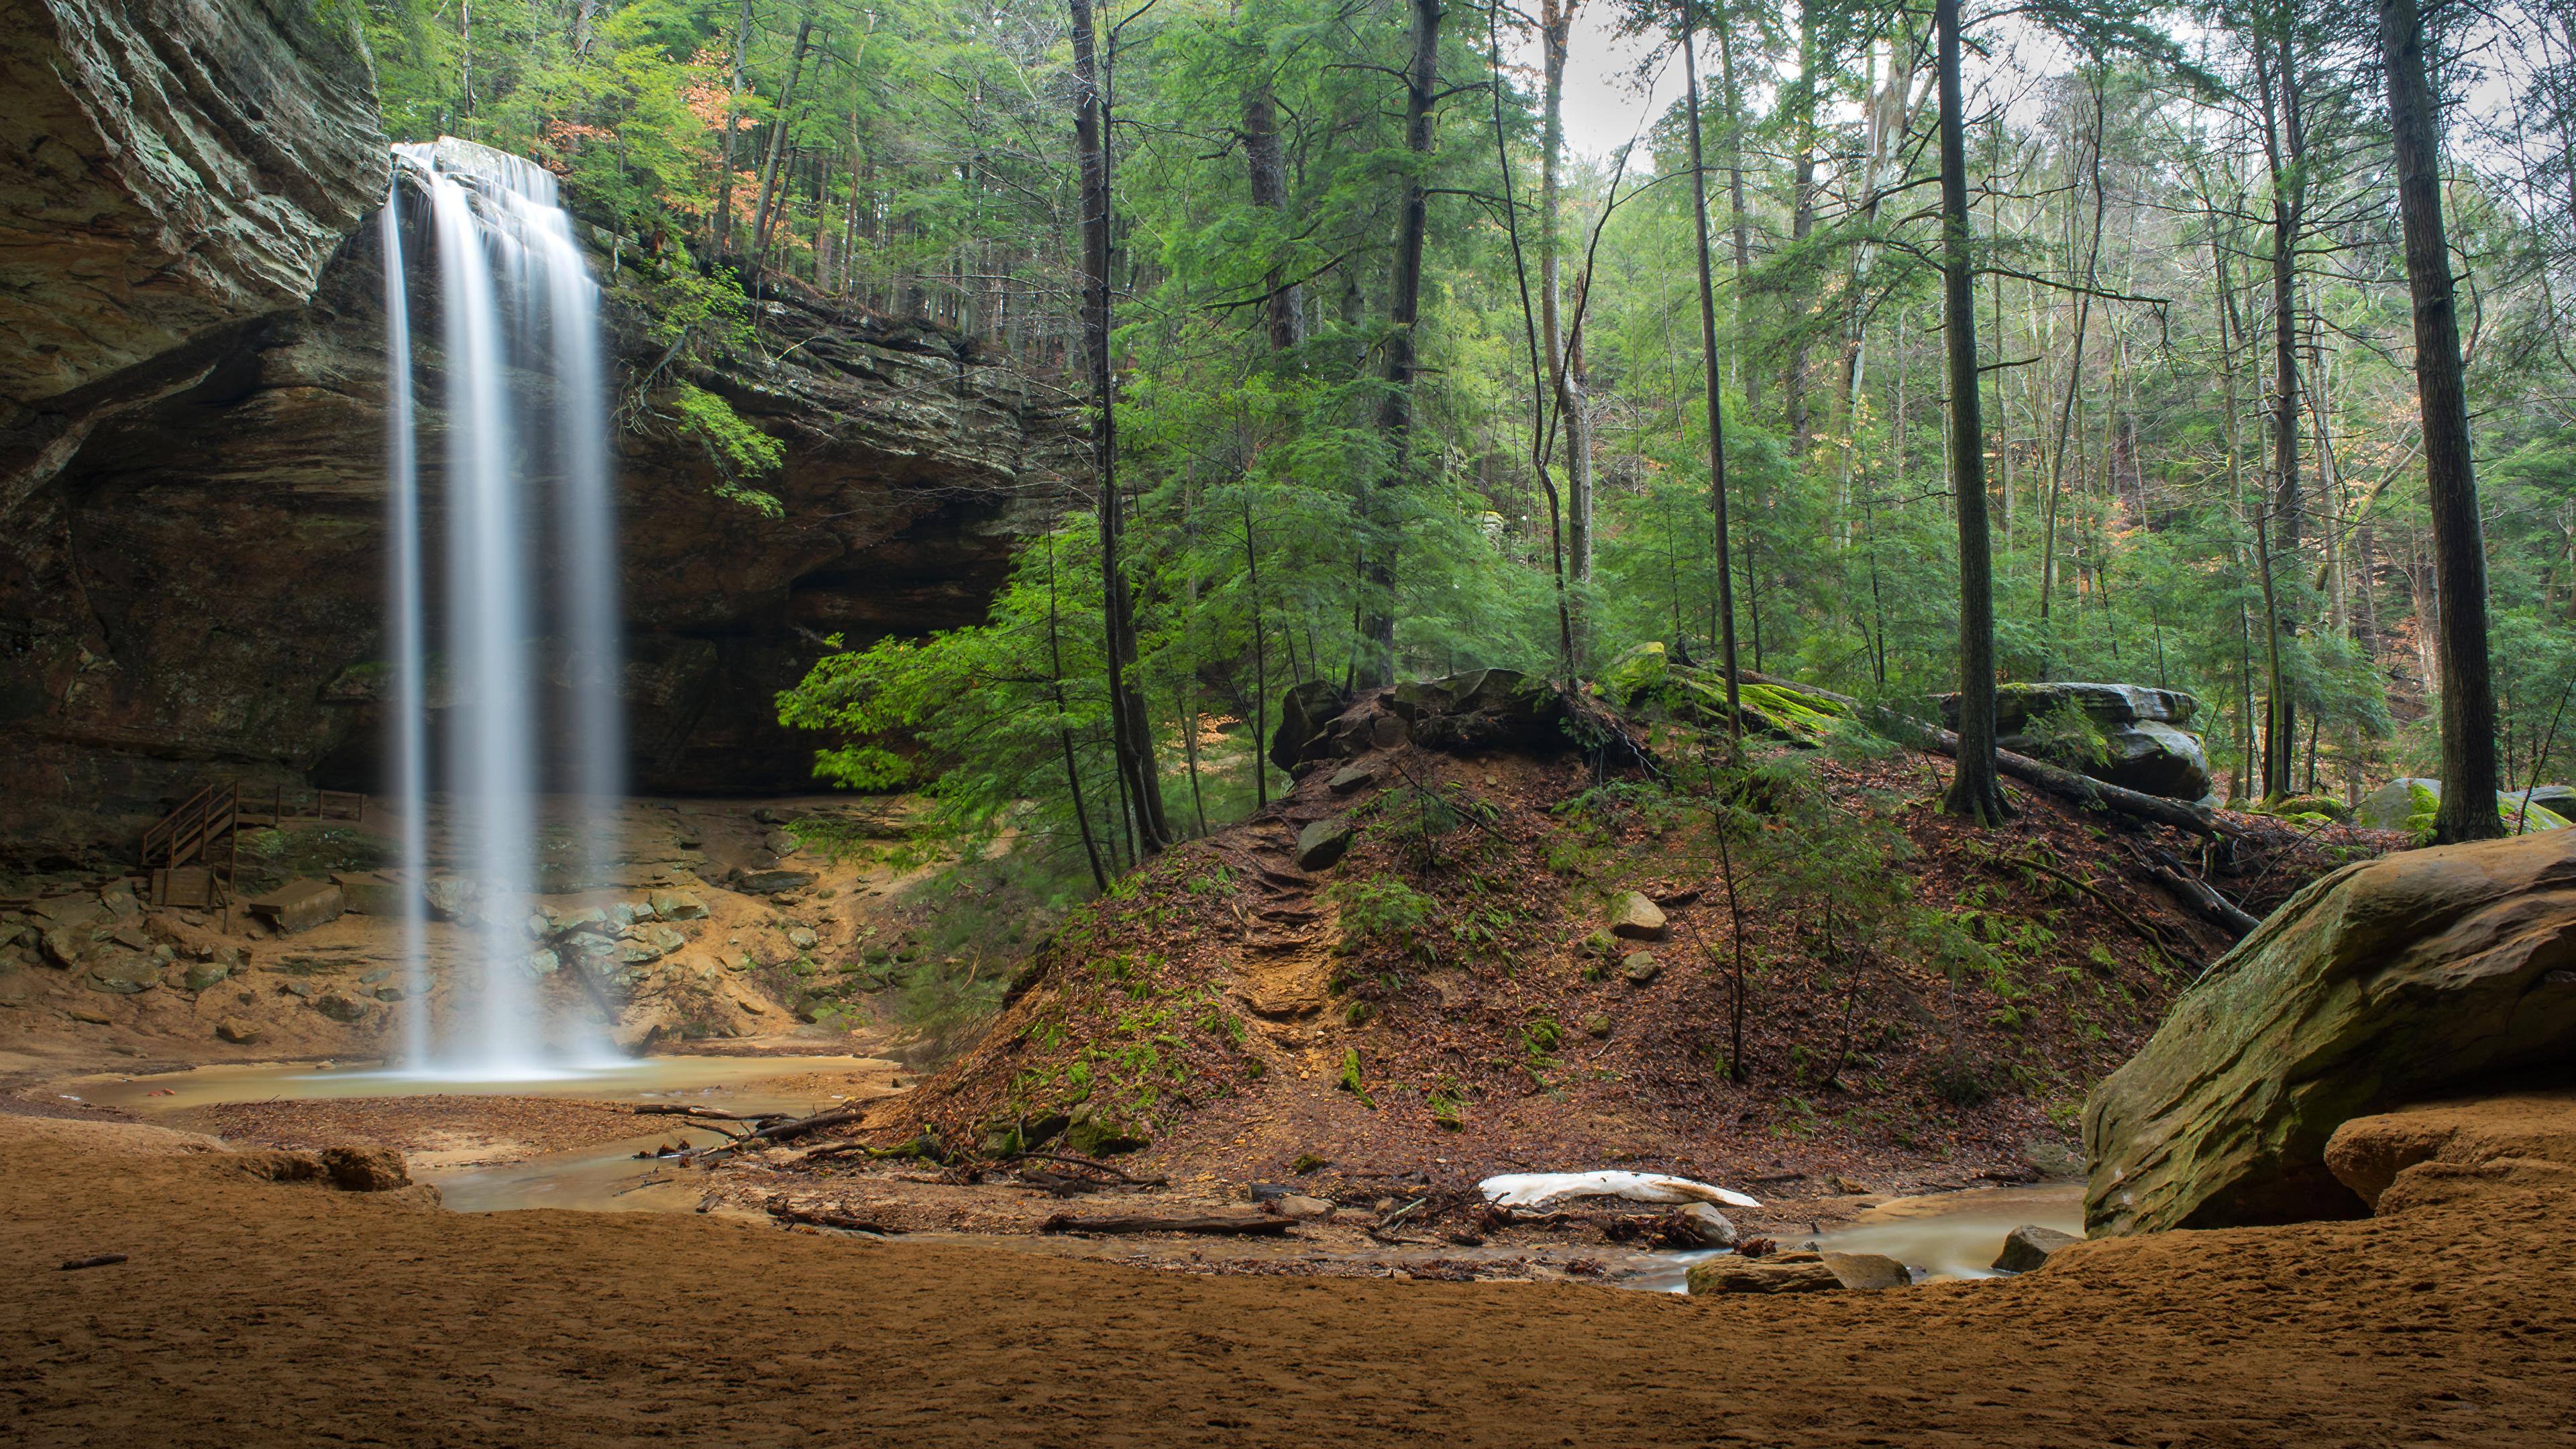 Фото США Hocking Hills Ohio Утес Природа Водопады парк Леса 3840x2160 штаты америка Скала скале скалы лес Парки